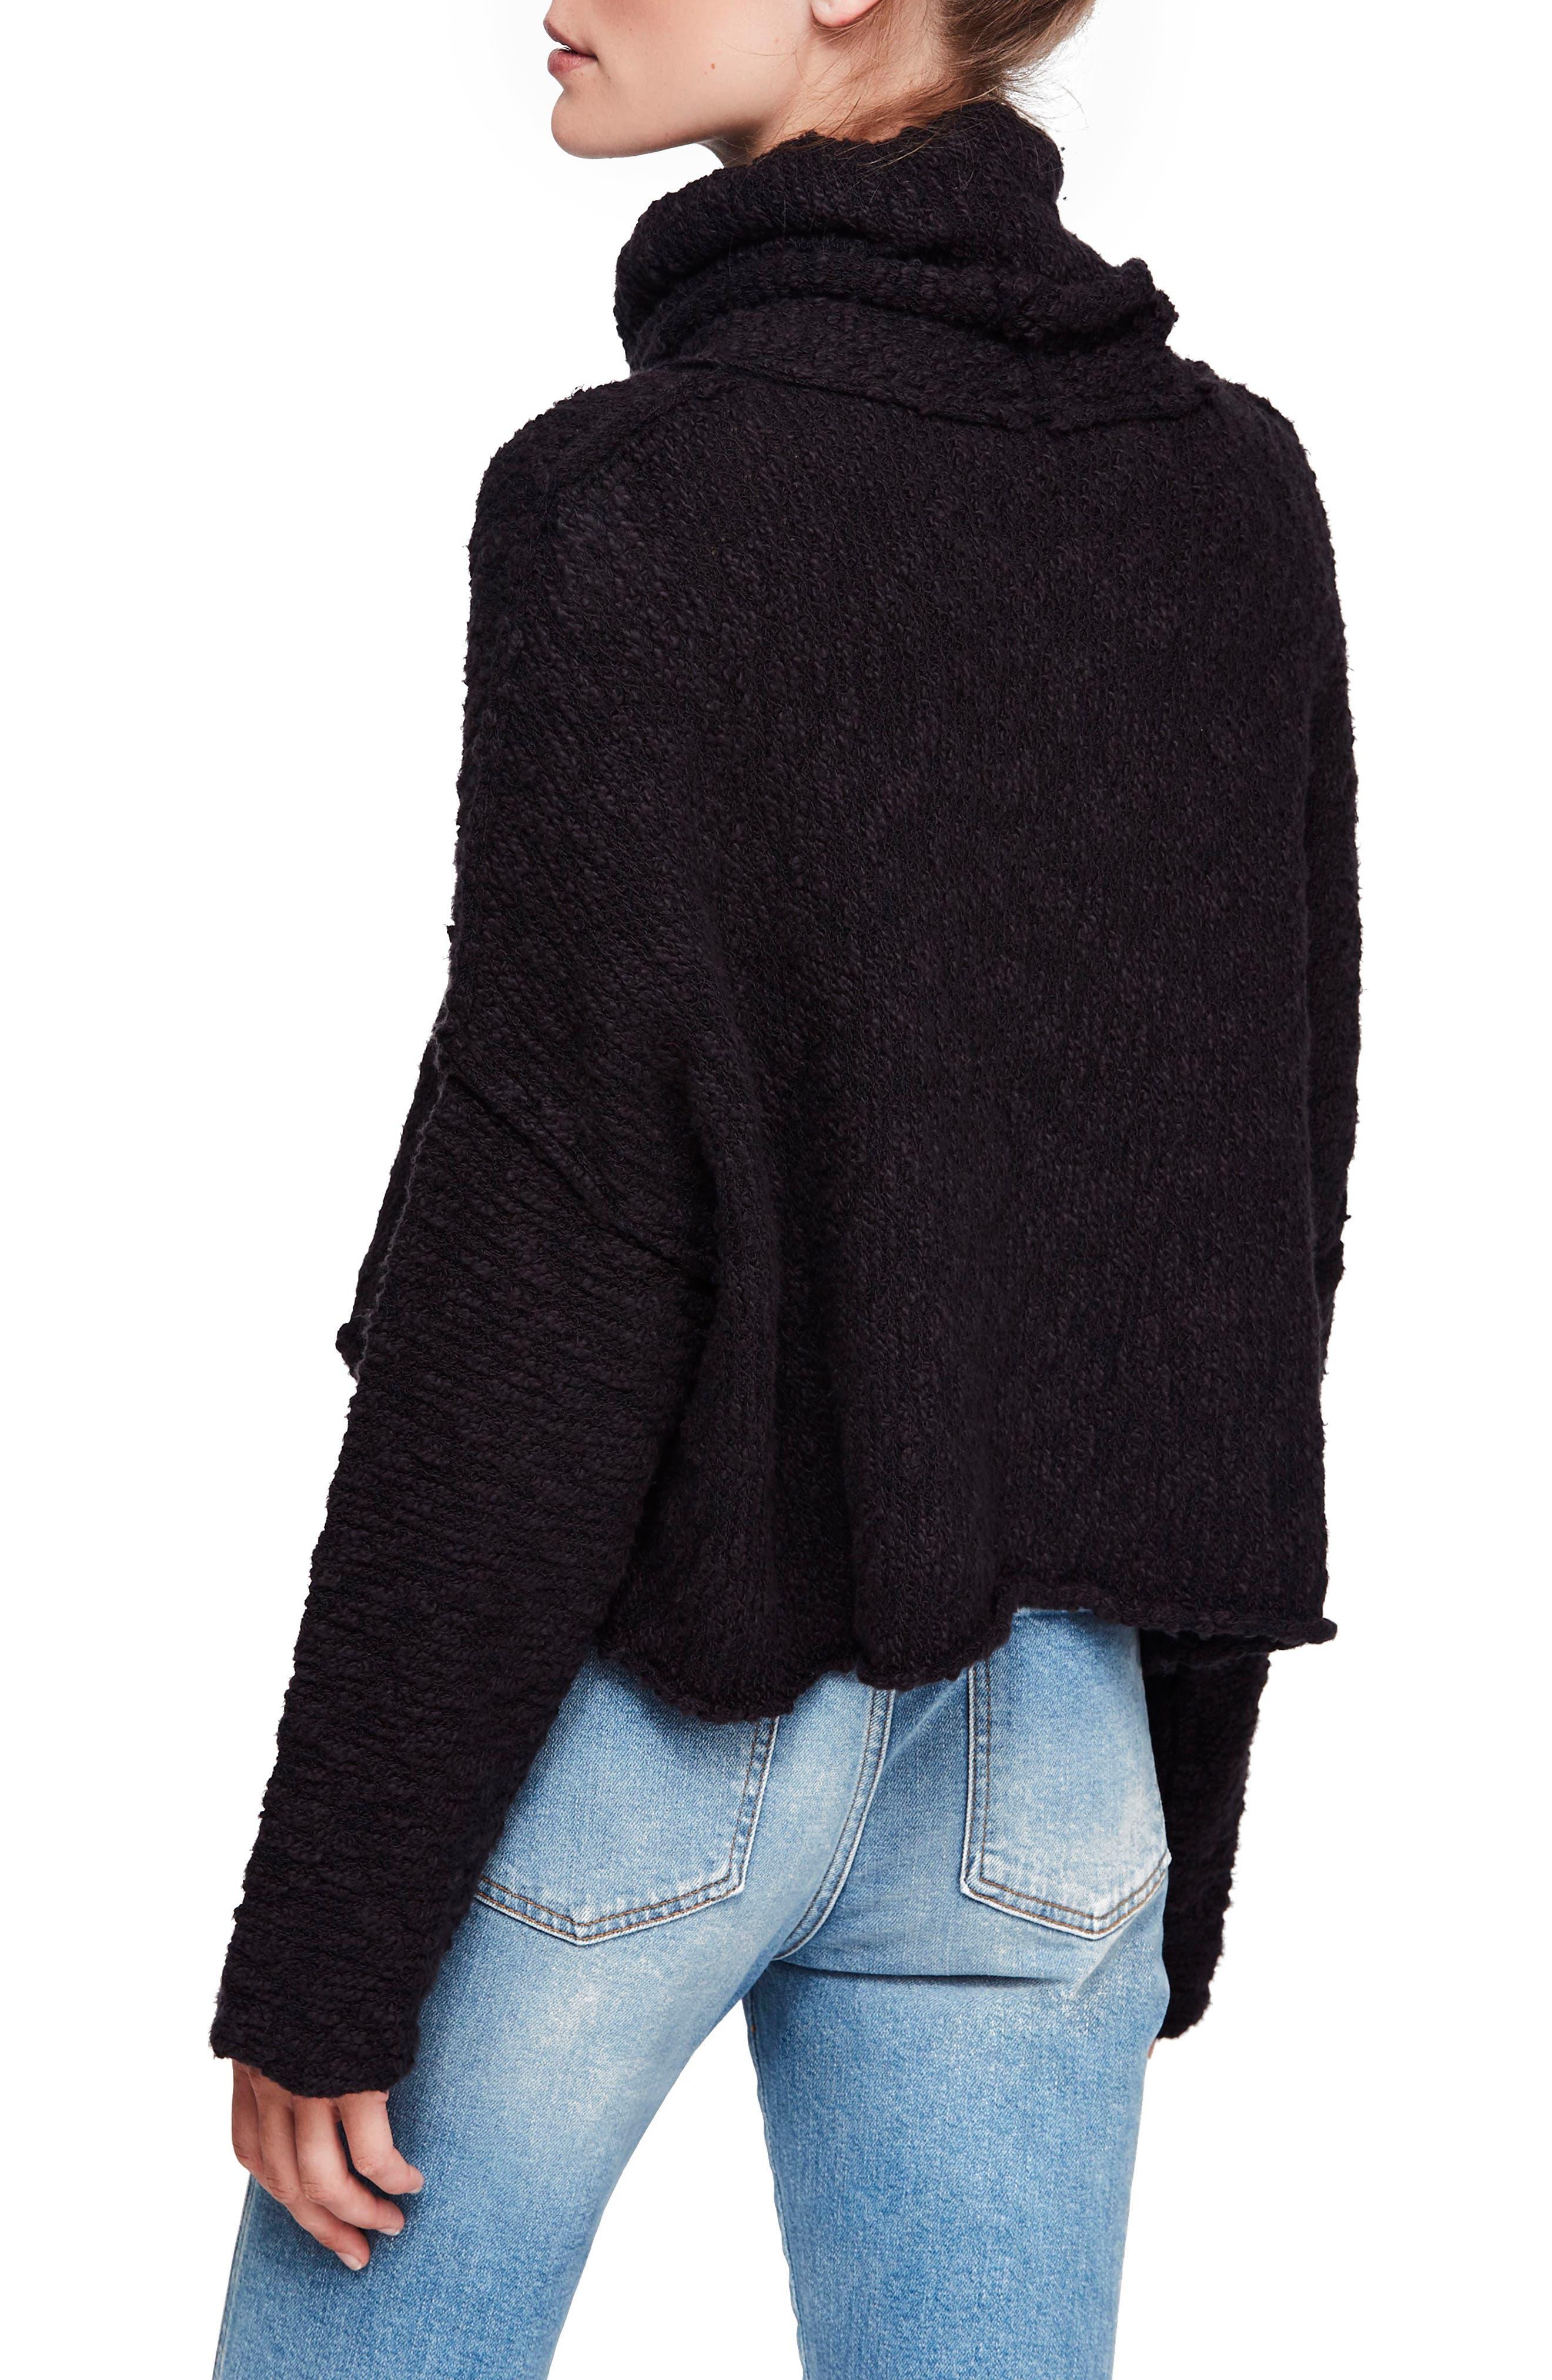 Big Easy Cowl Neck Crop Sweater,                             Alternate thumbnail 2, color,                             BLACK